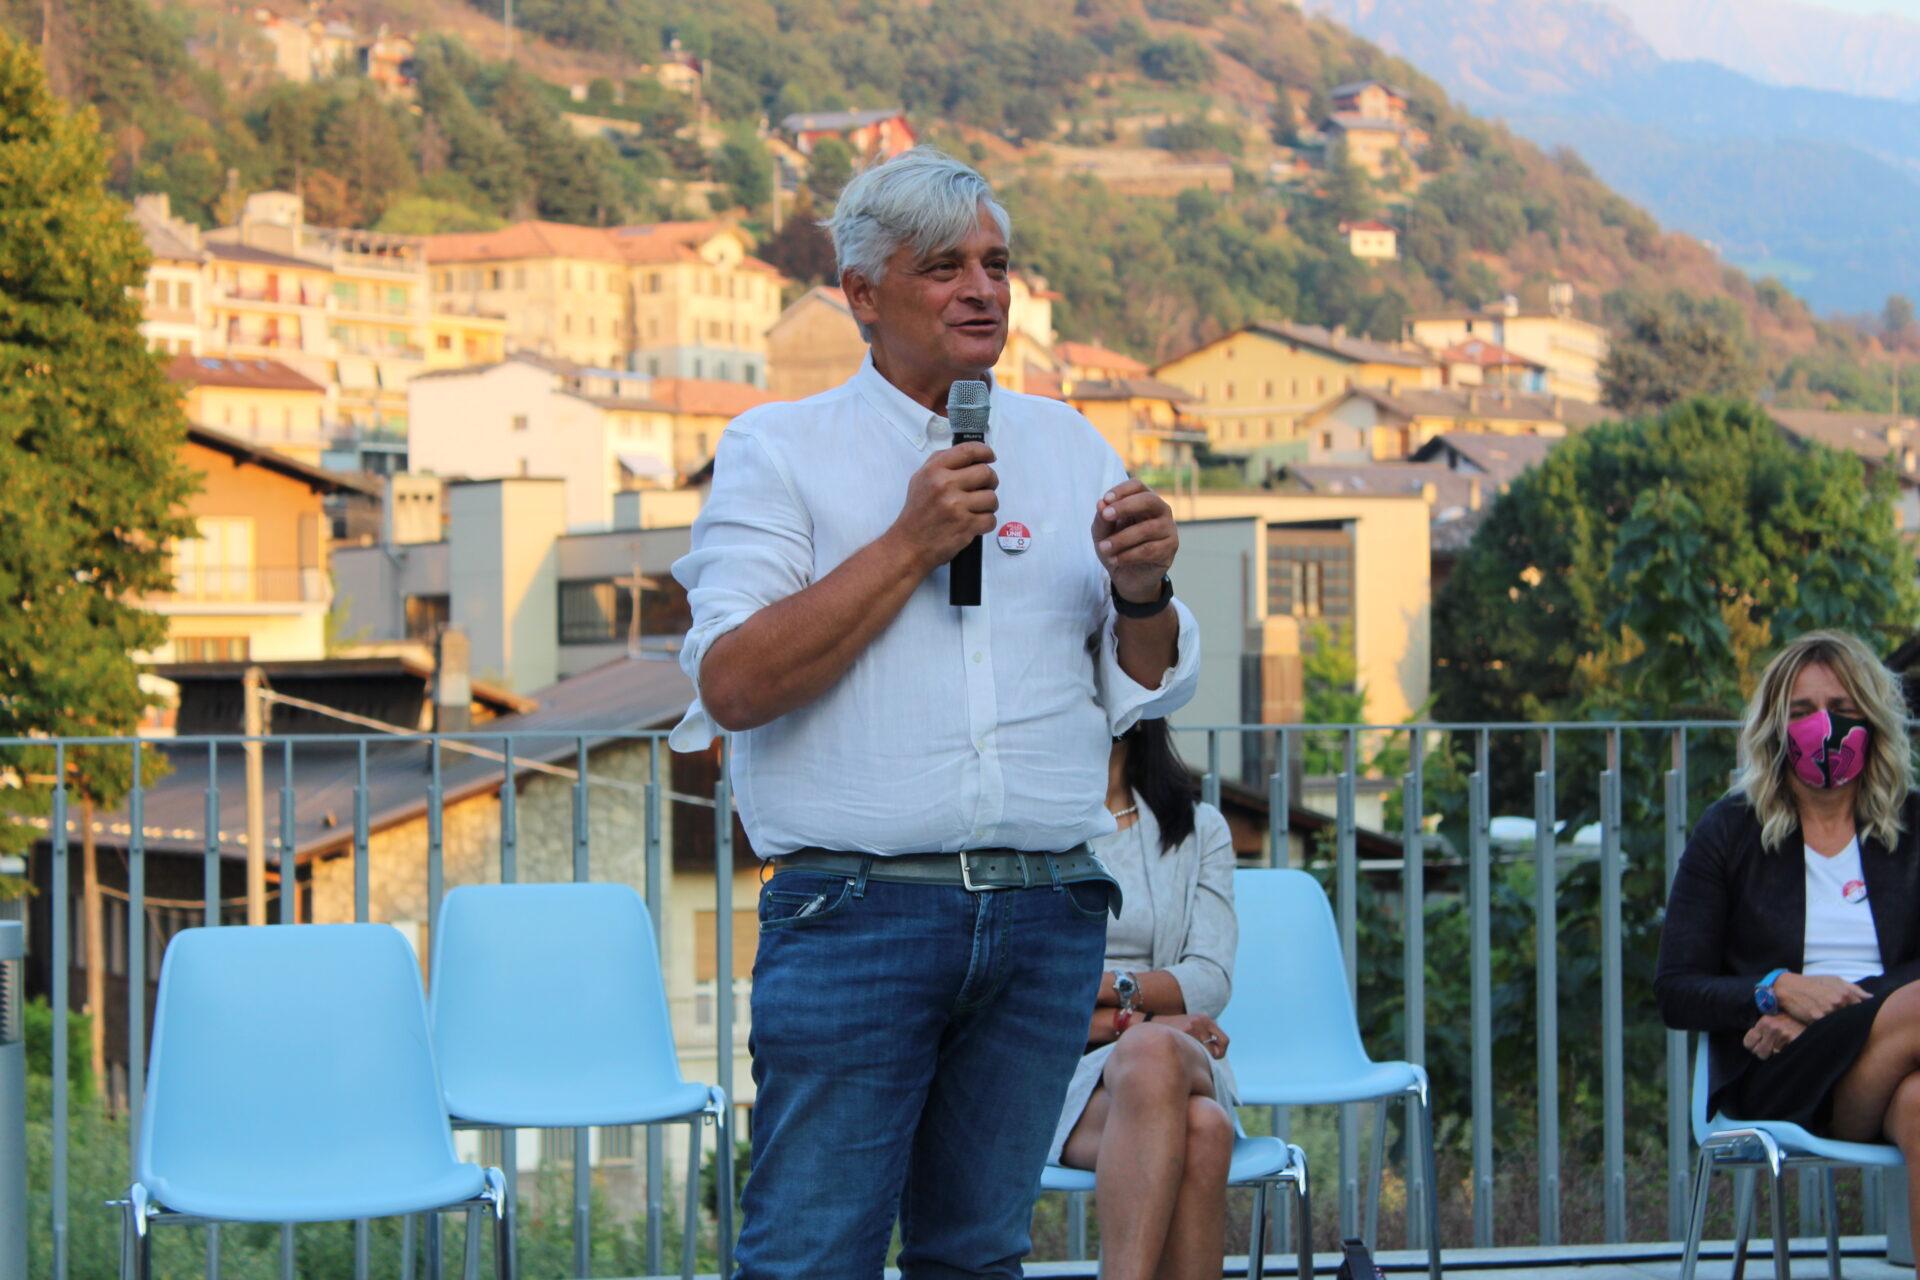 VdA Unie - Luciano Caveri